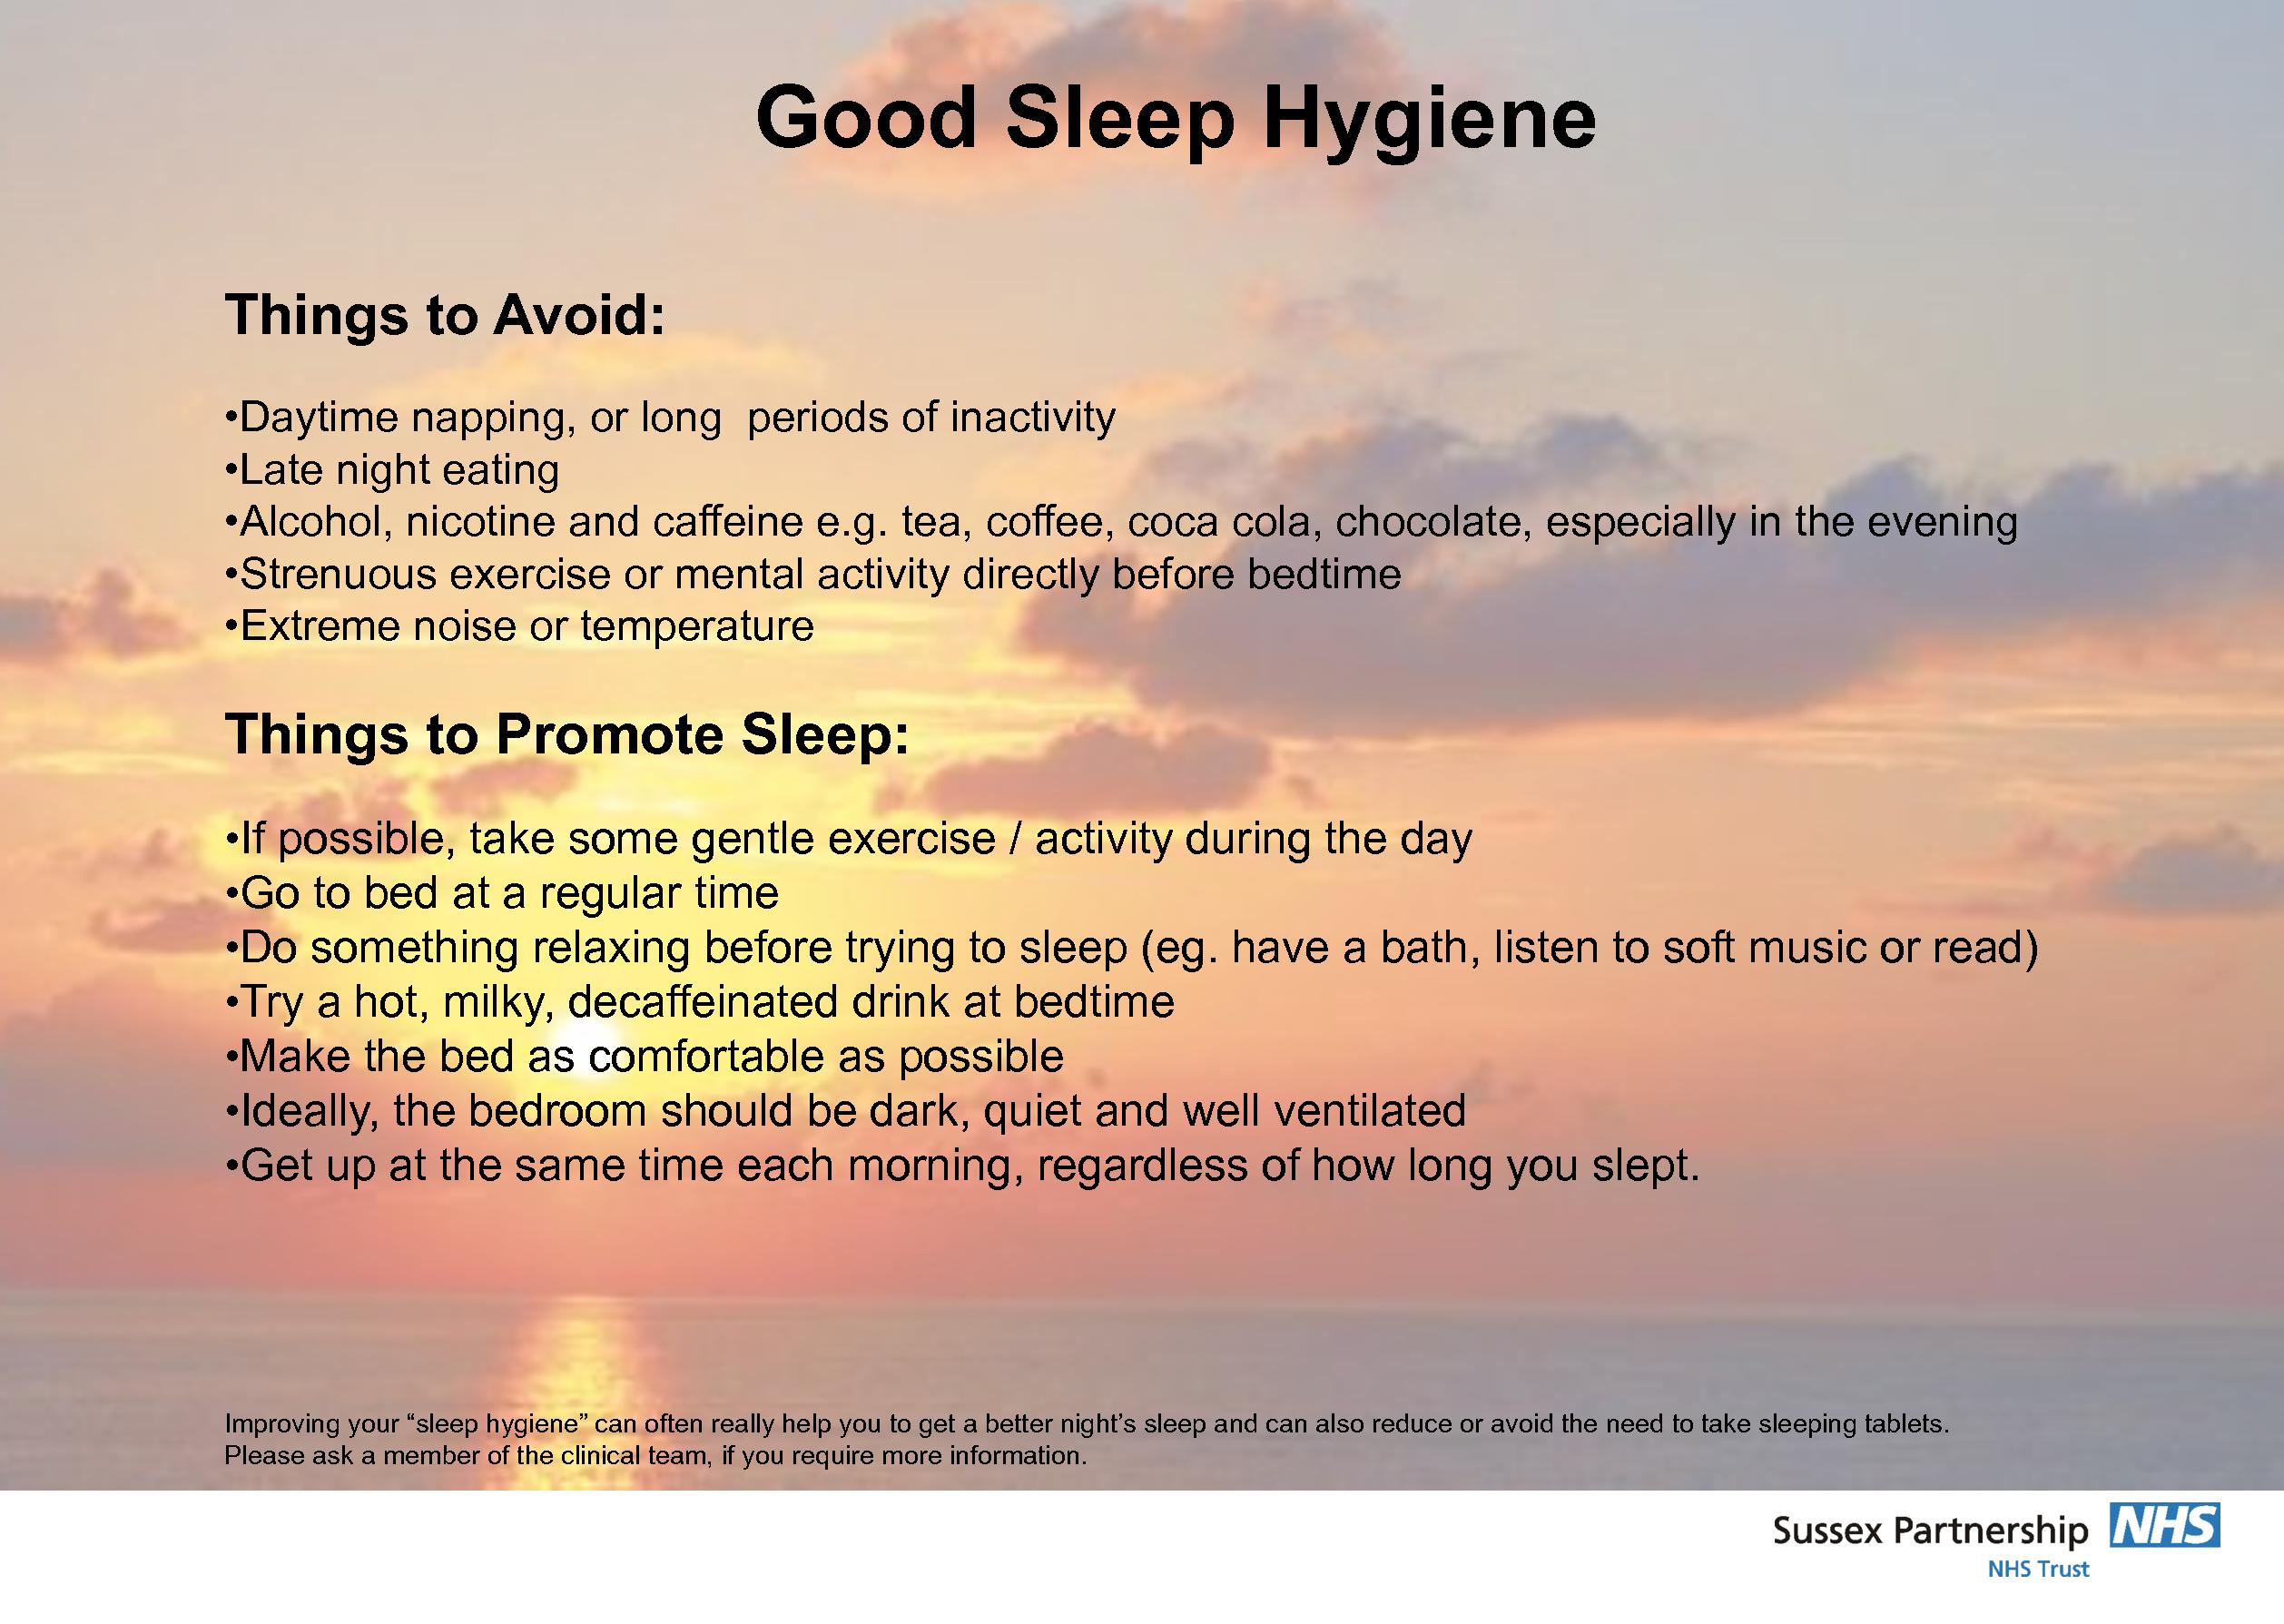 worksheet Sleep Hygiene Worksheet sleep hygiene worksheet photos pigmu tips for good sleep